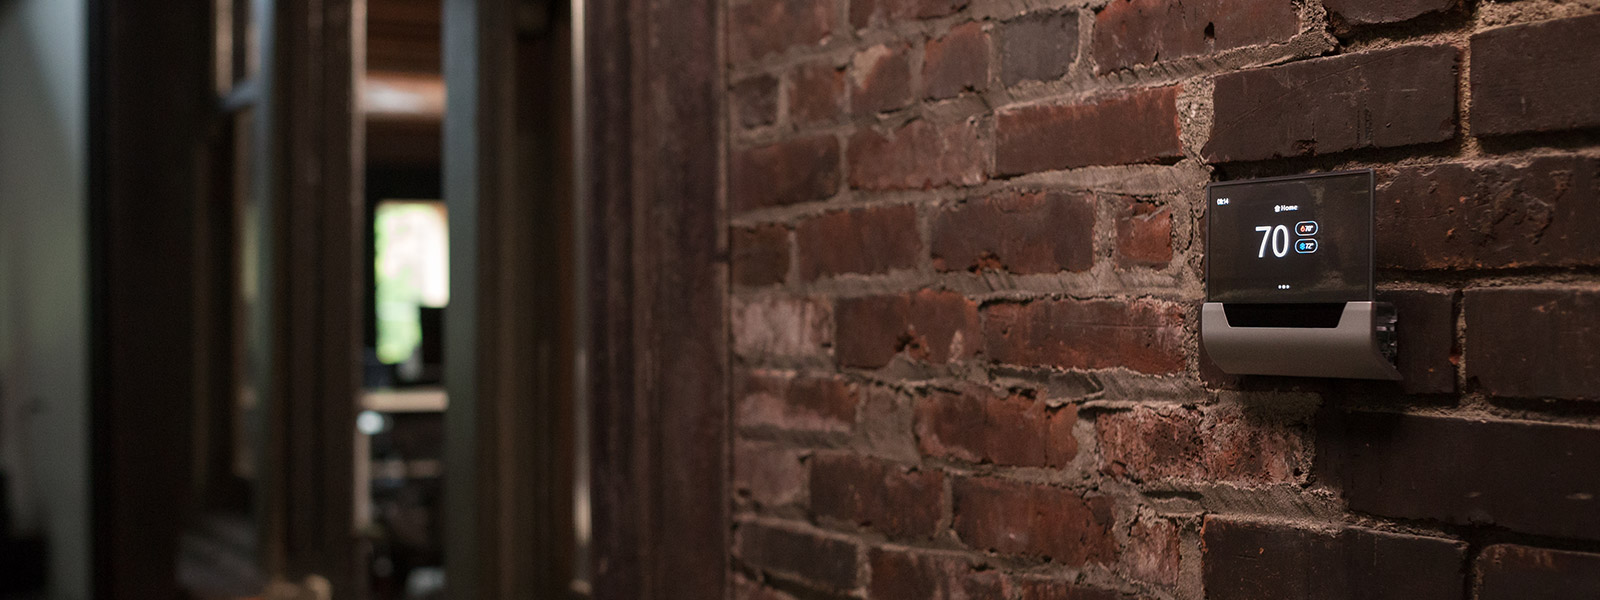 Temperature control panel on brick wall